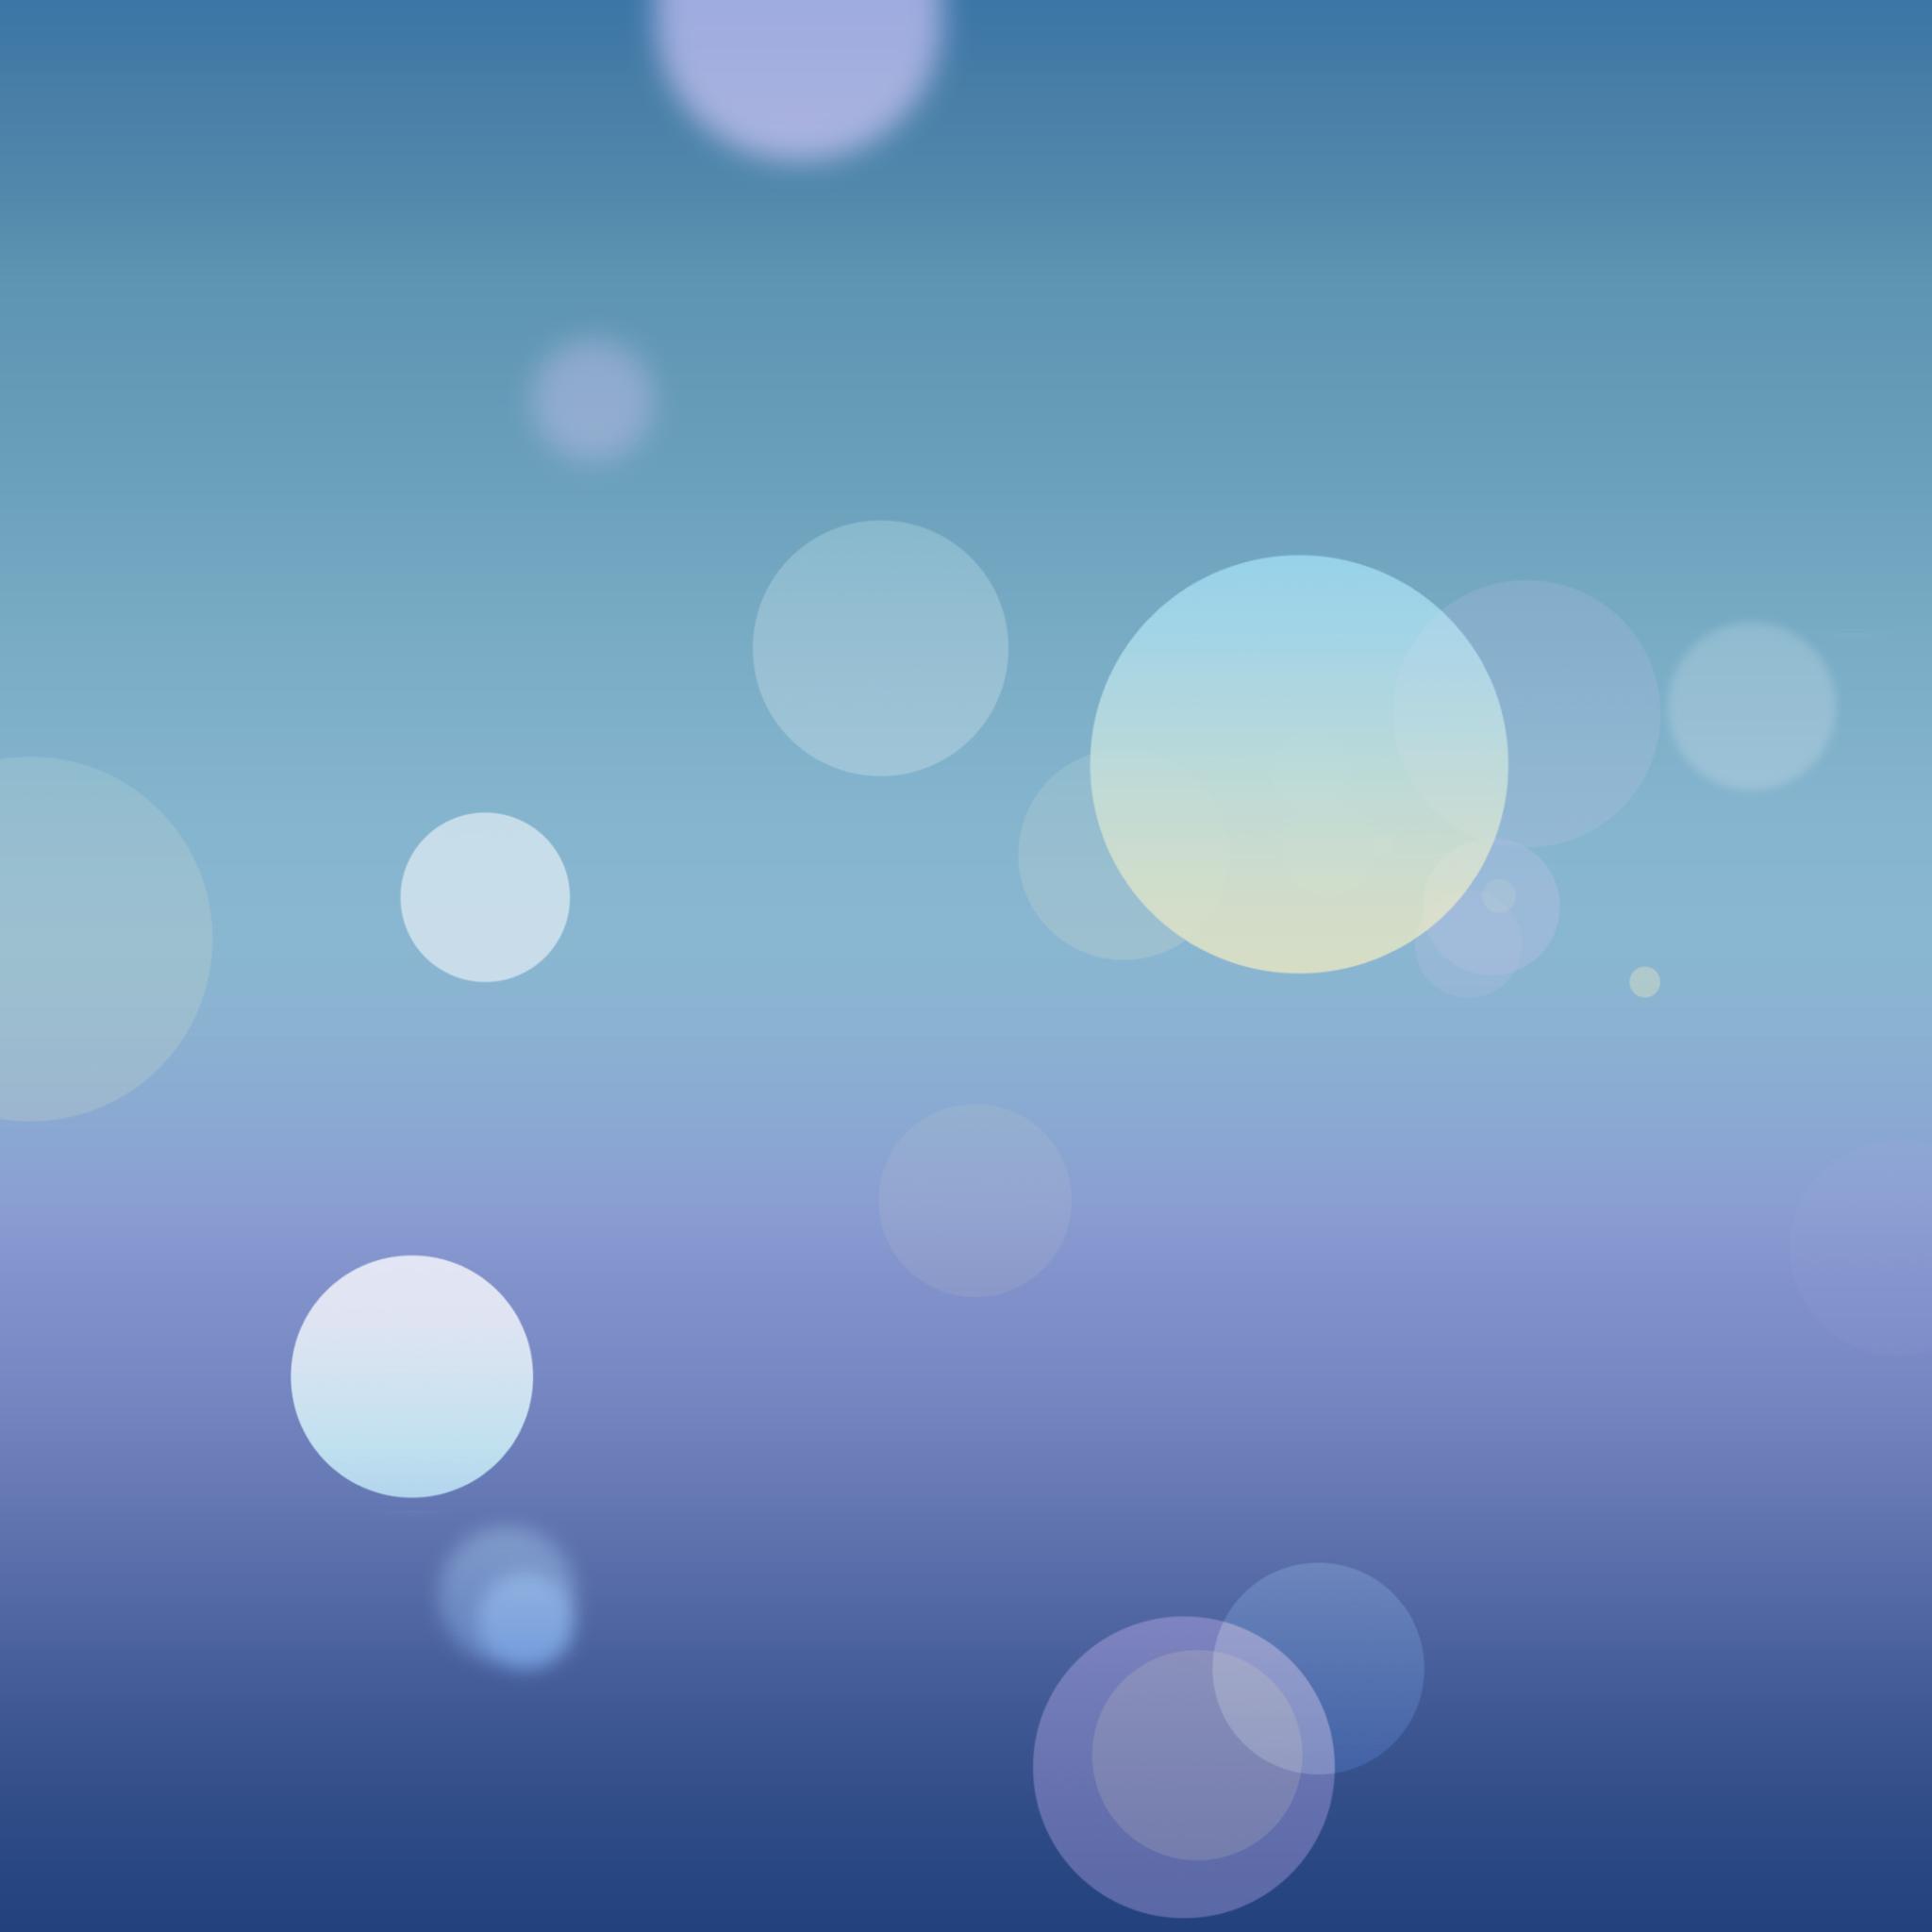 iOS 7 Wallpapers 3Wallpapers iPad Retina 2048x2048